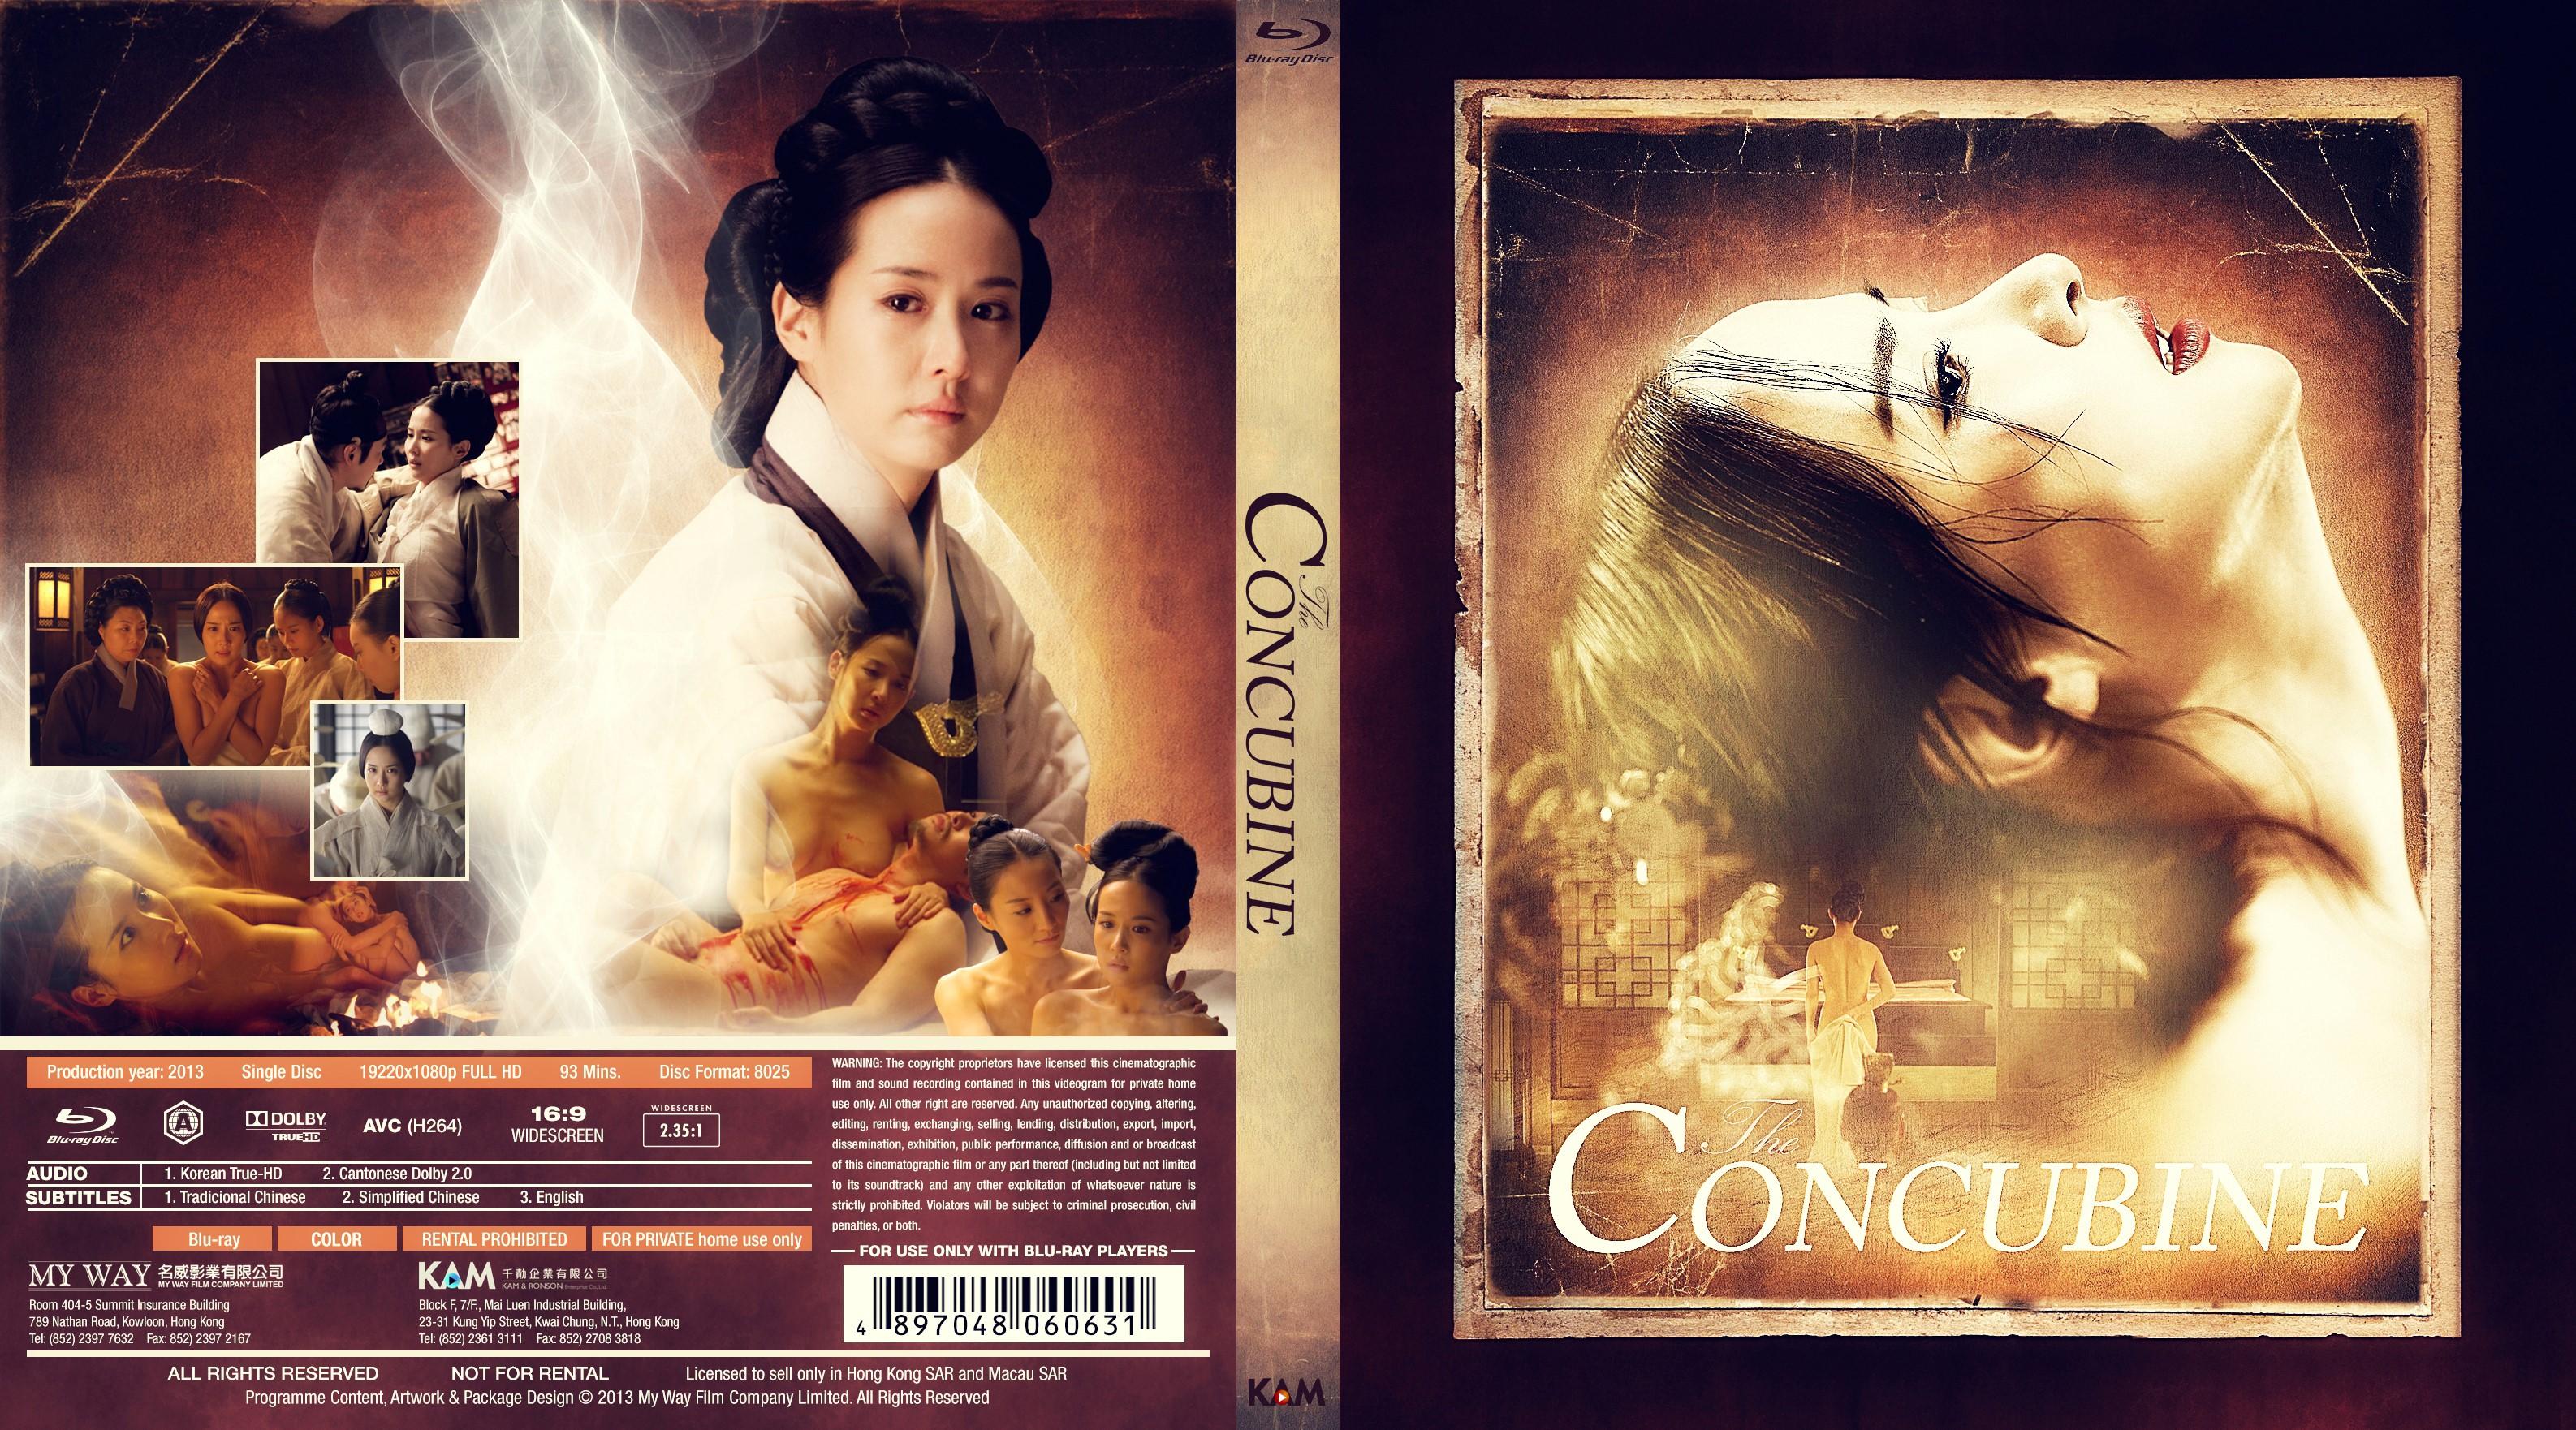 the concubine korean movie eng sub